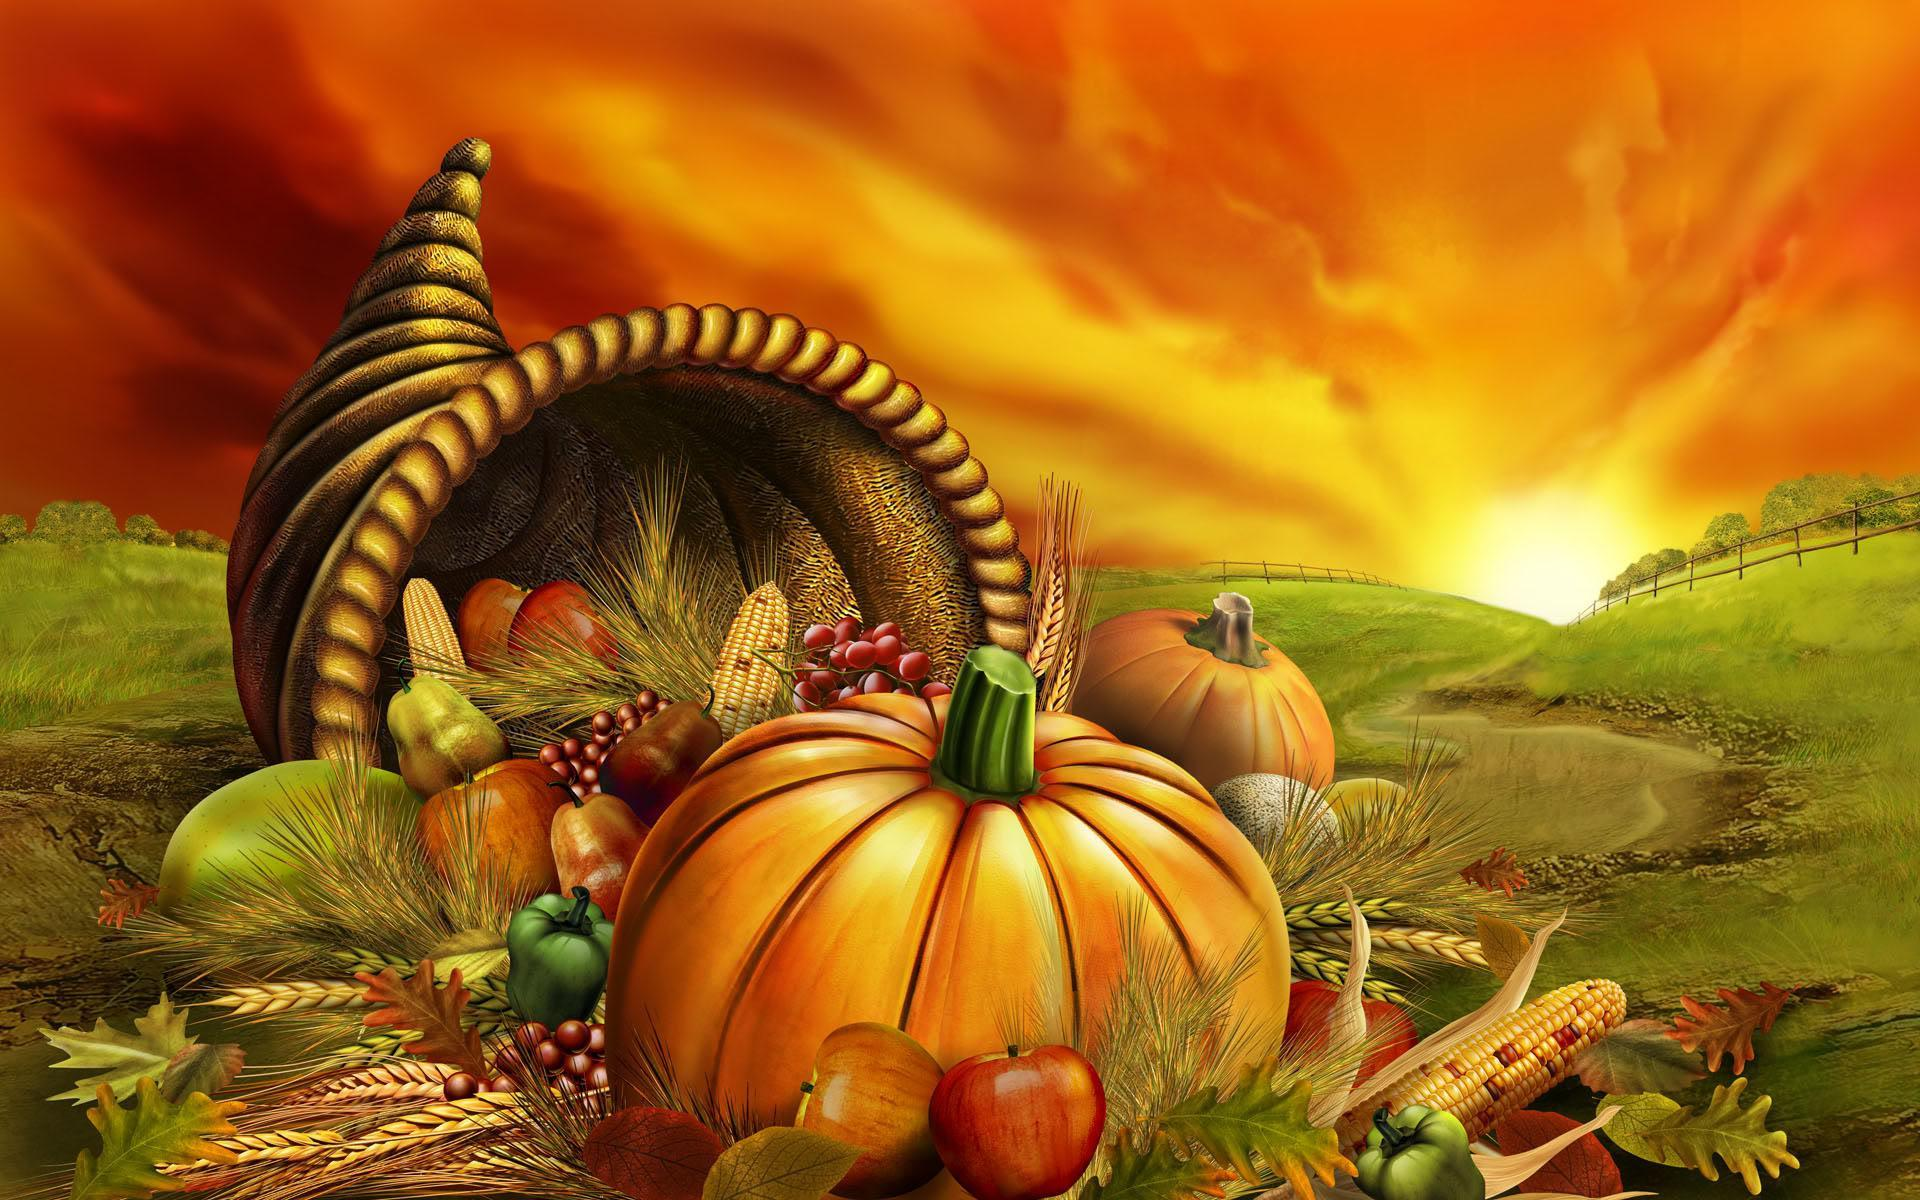 download wallpaper: Thanksgiving wallpaper